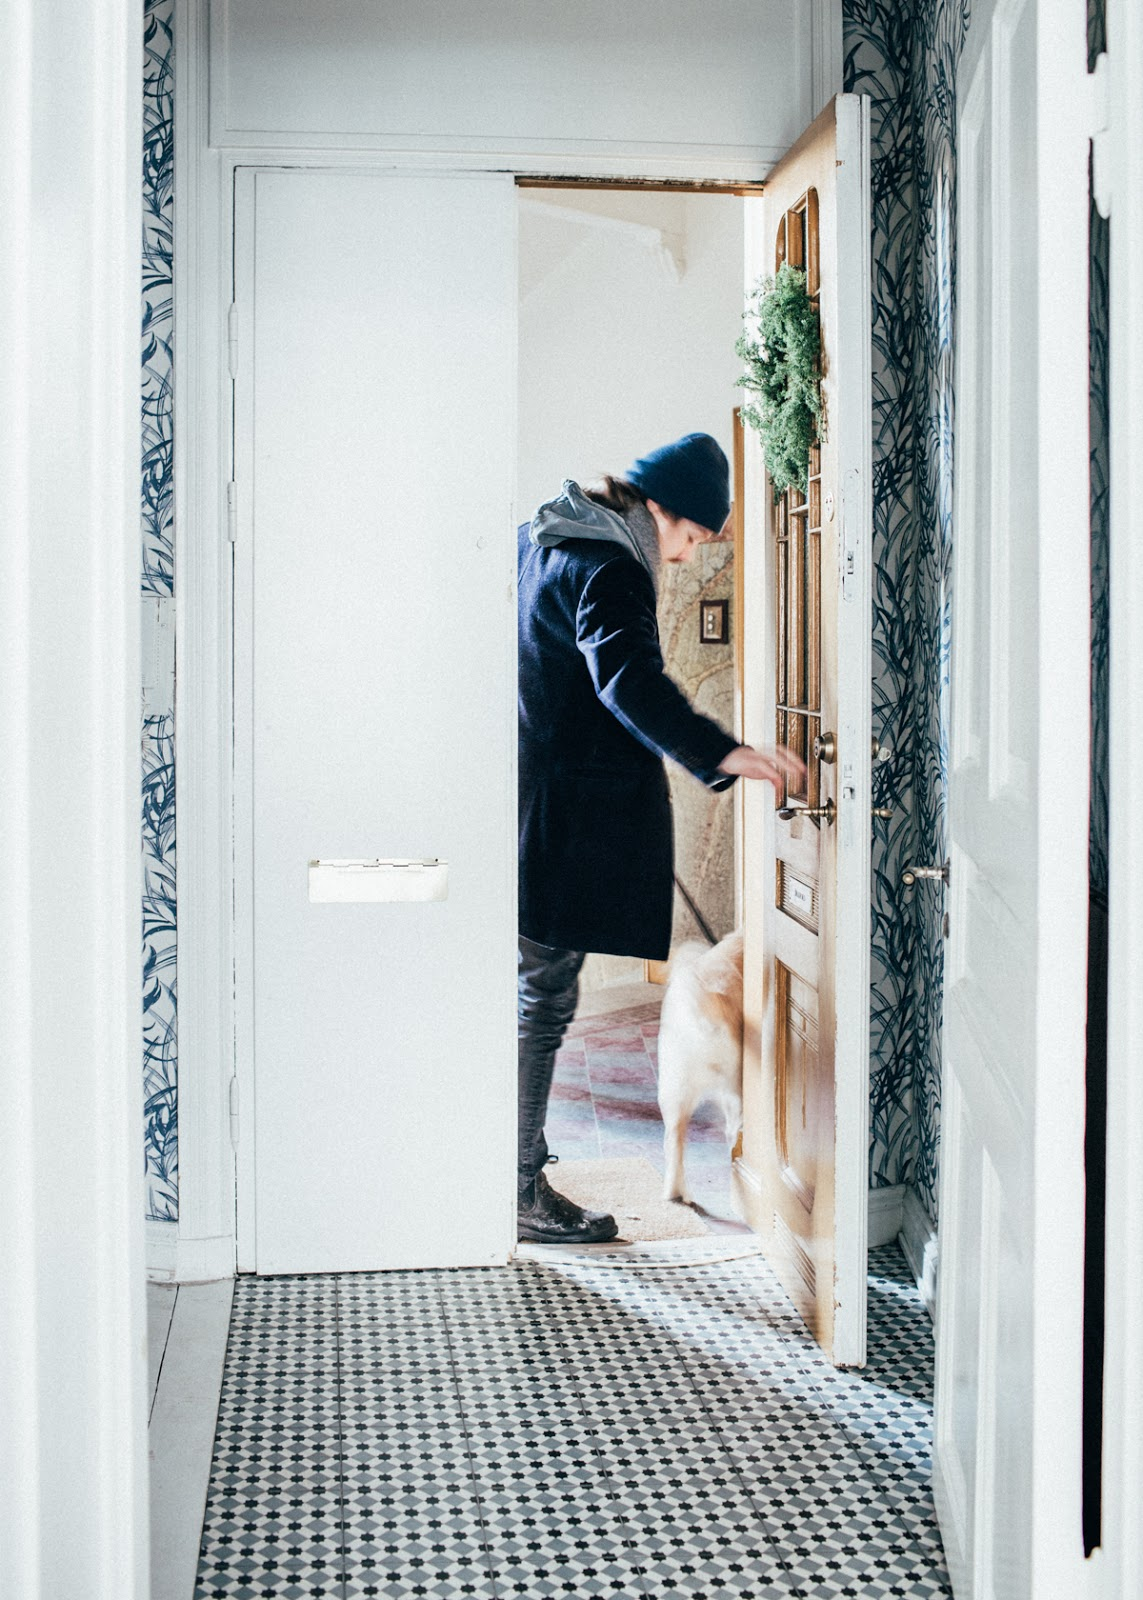 Decor Inspiration At Home With Johanna Bradford At G Teborg By Kristin Lagerqvist Cool